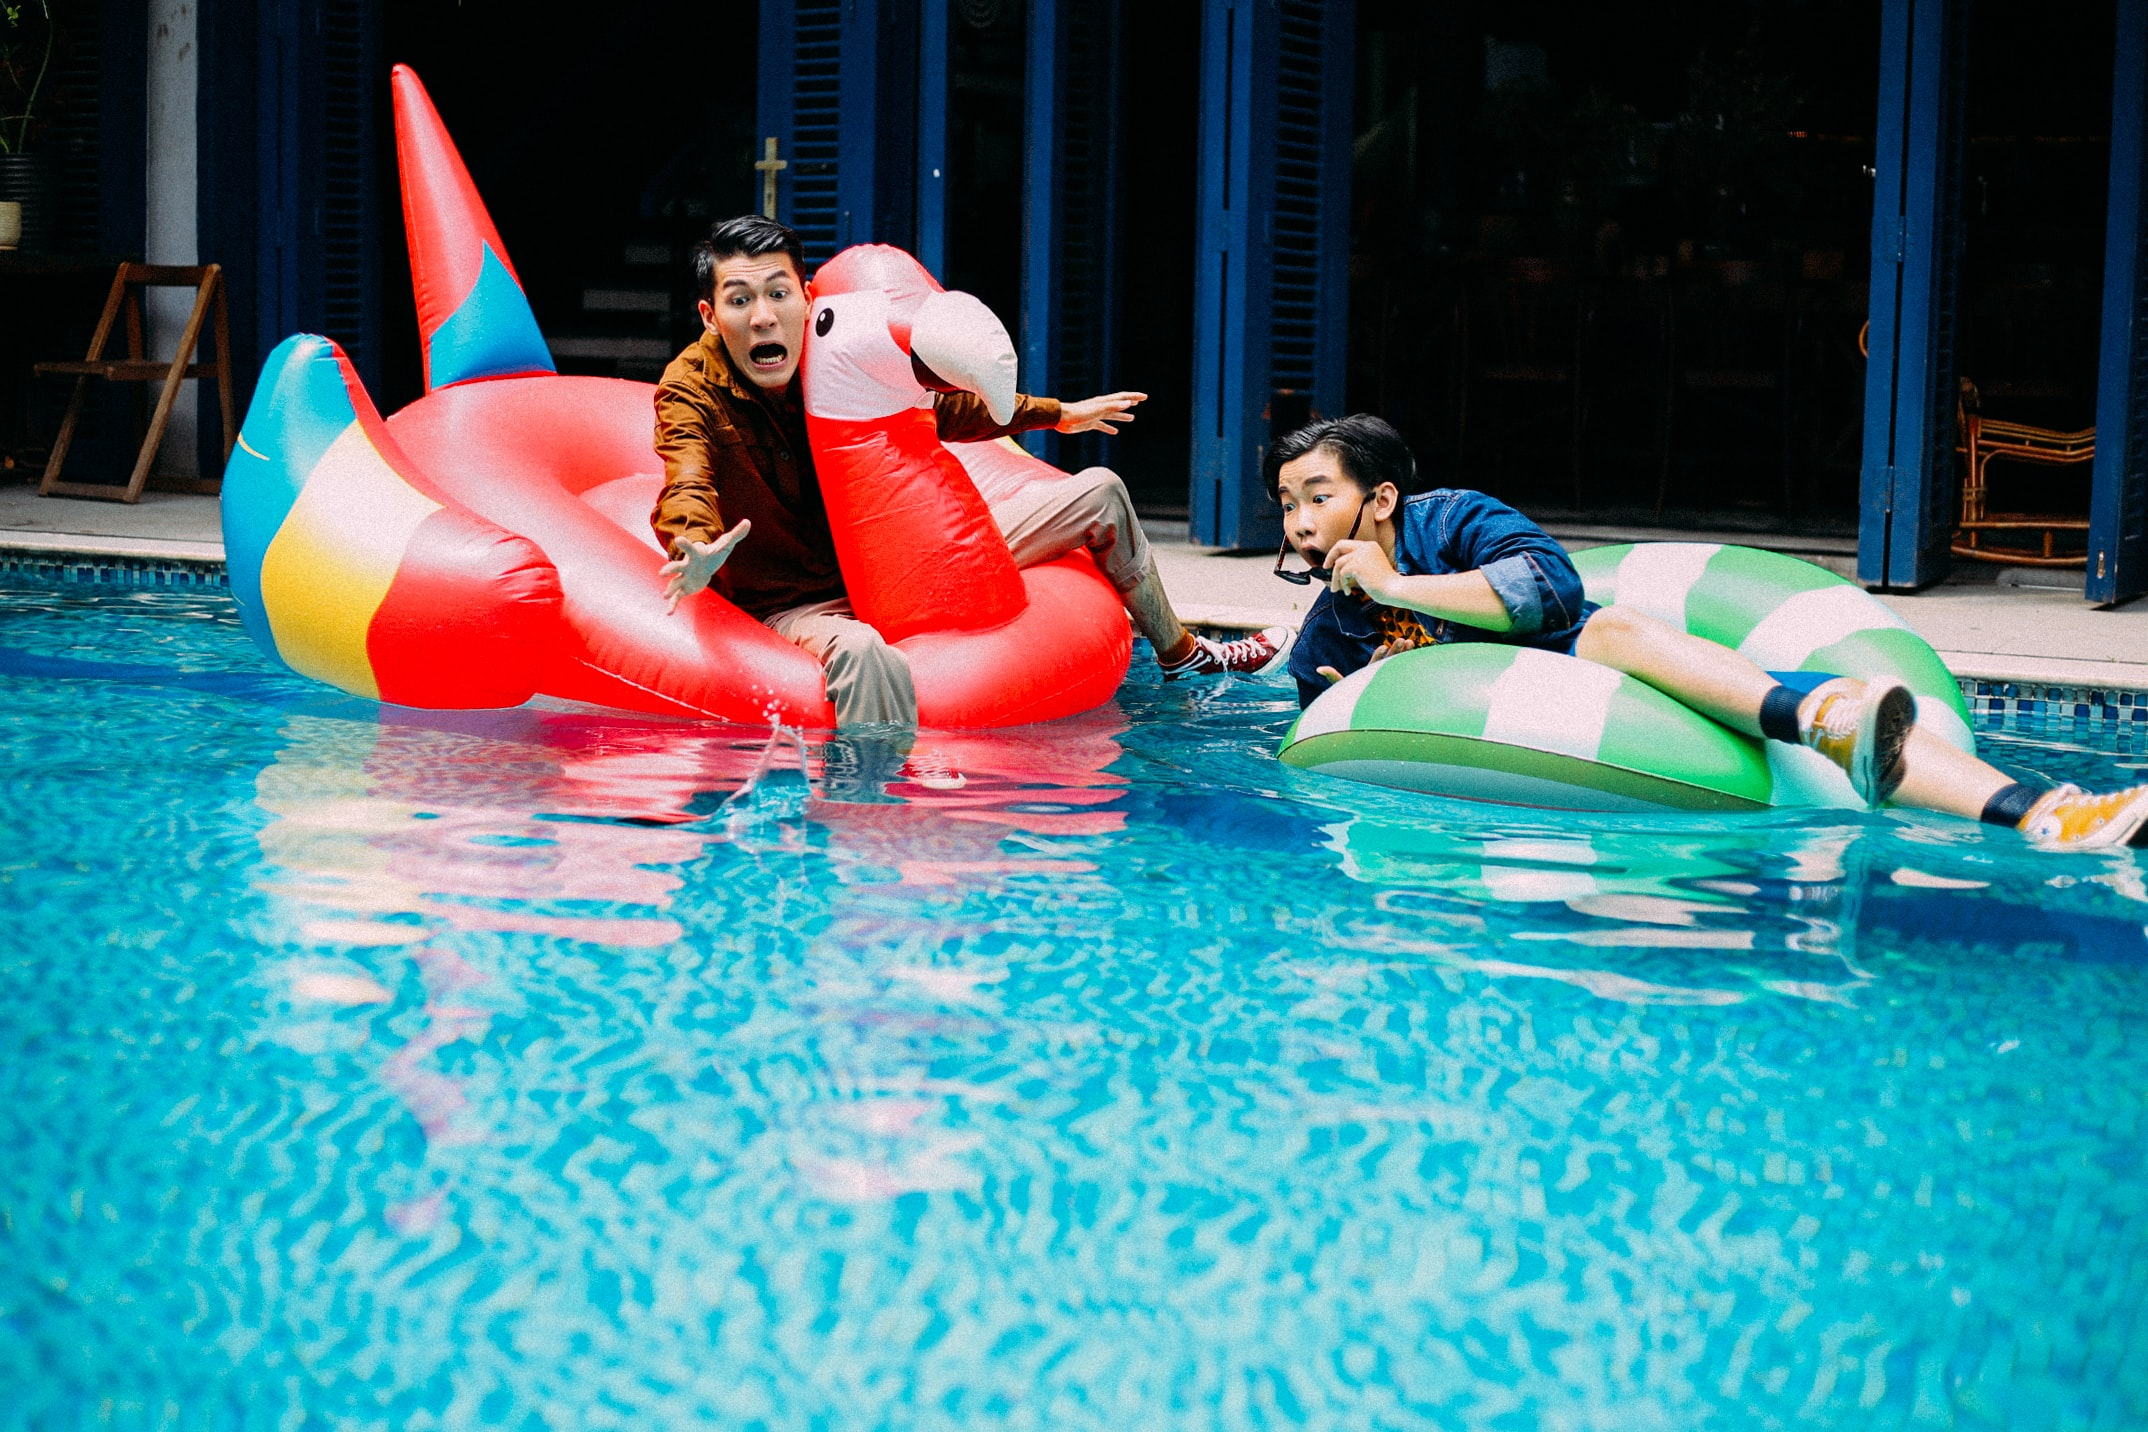 two men on pool float during daytime